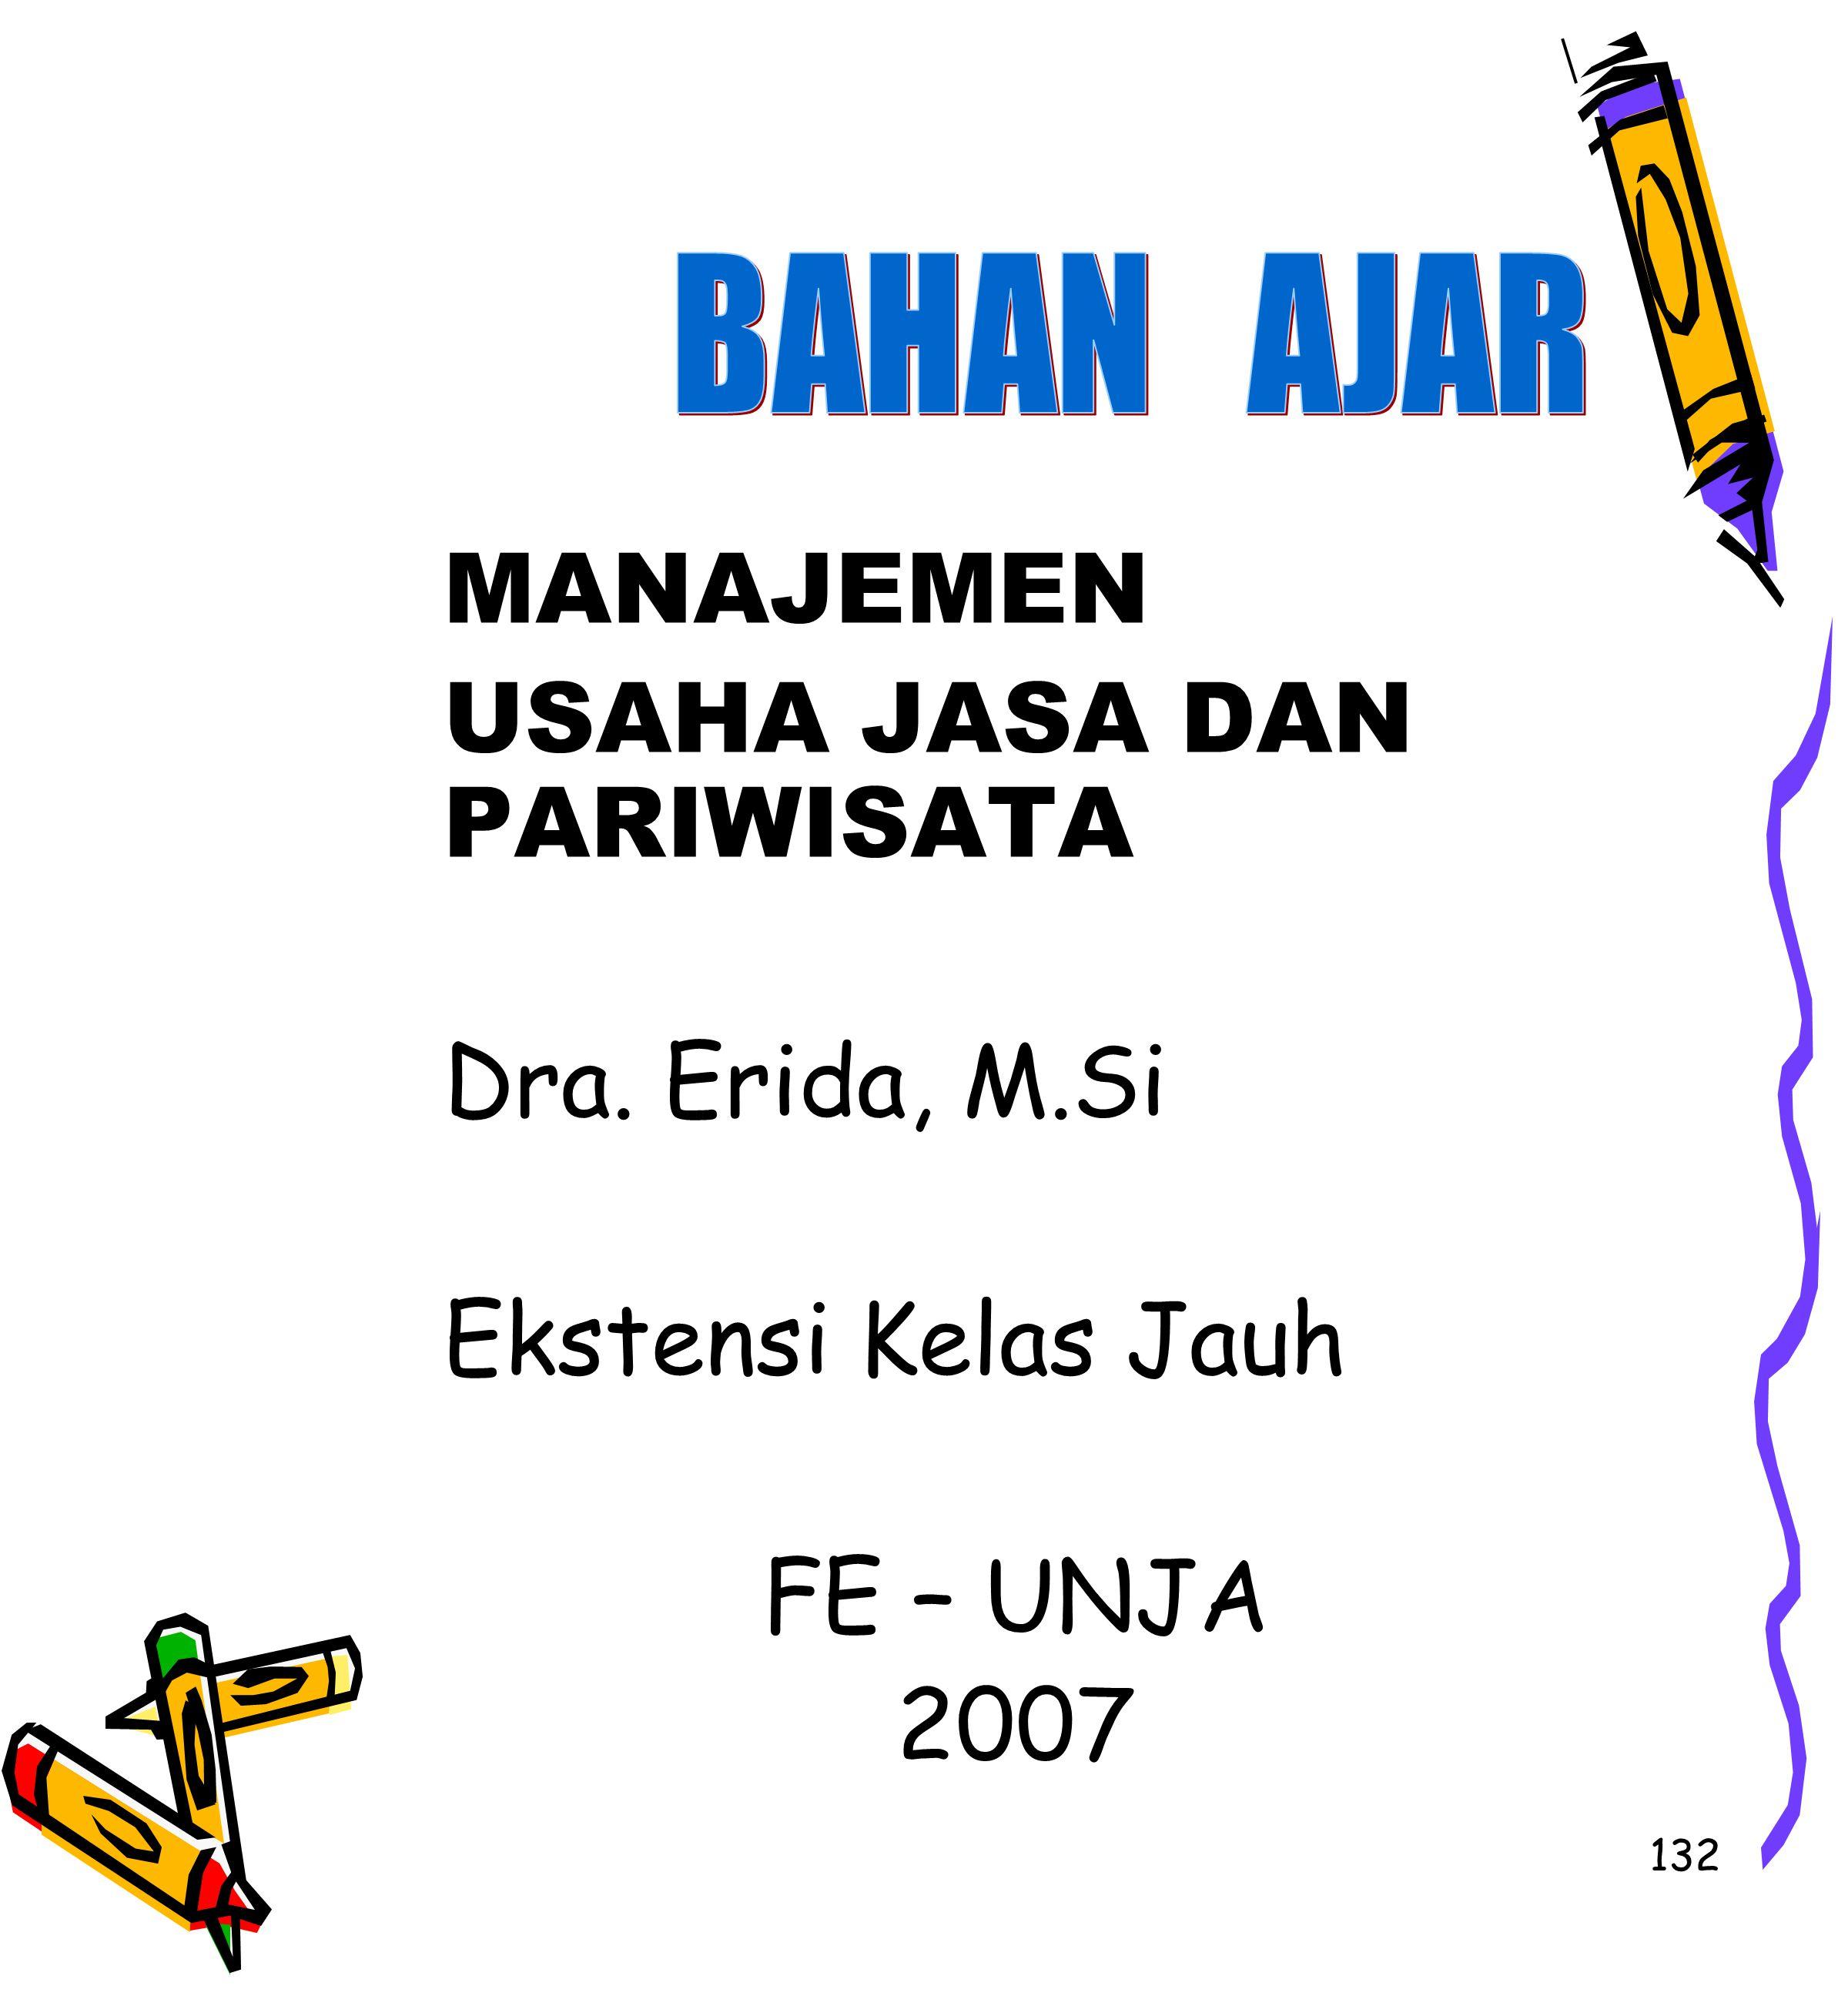 132 MANAJEMEN USAHA JASA DAN PARIWISATA Dra. Erida, M.Si Ekstensi Kelas Jauh FE – UNJA 2007